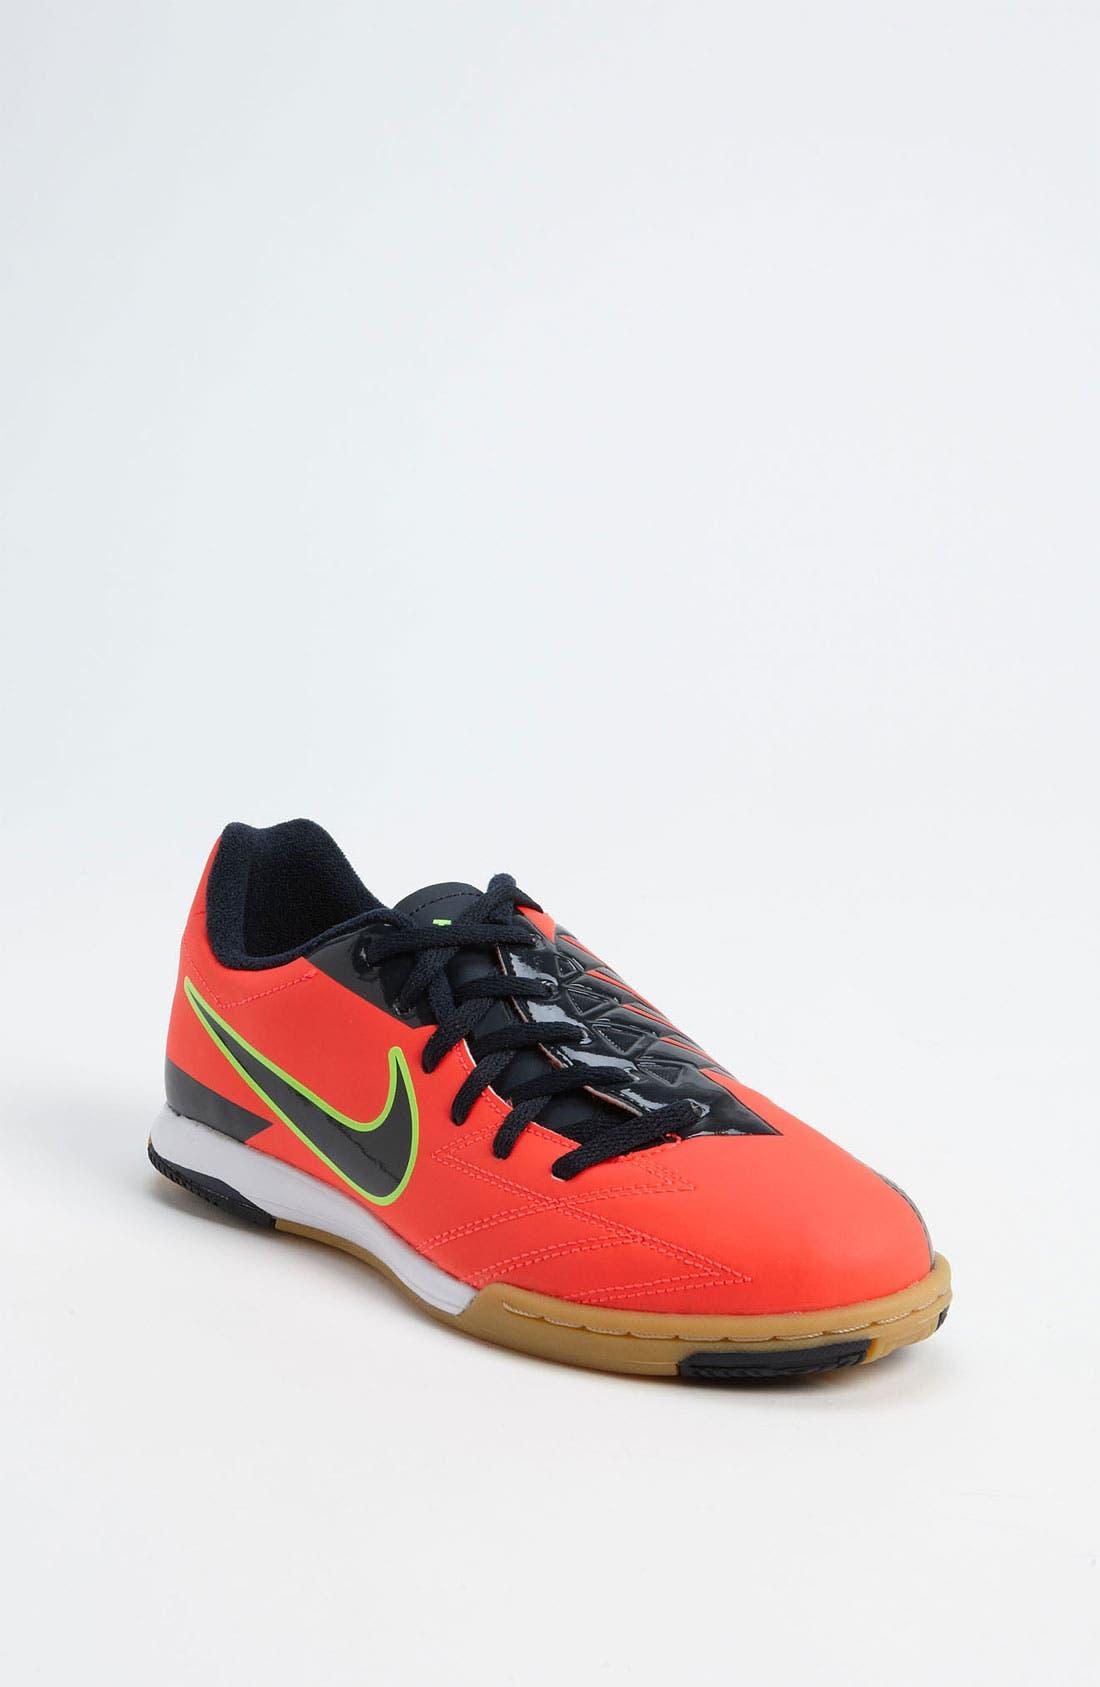 Alternate Image 1 Selected - Nike 'T90 Shoot IV' Soccer Shoe (Toddler, Little Kid & Big Kid)